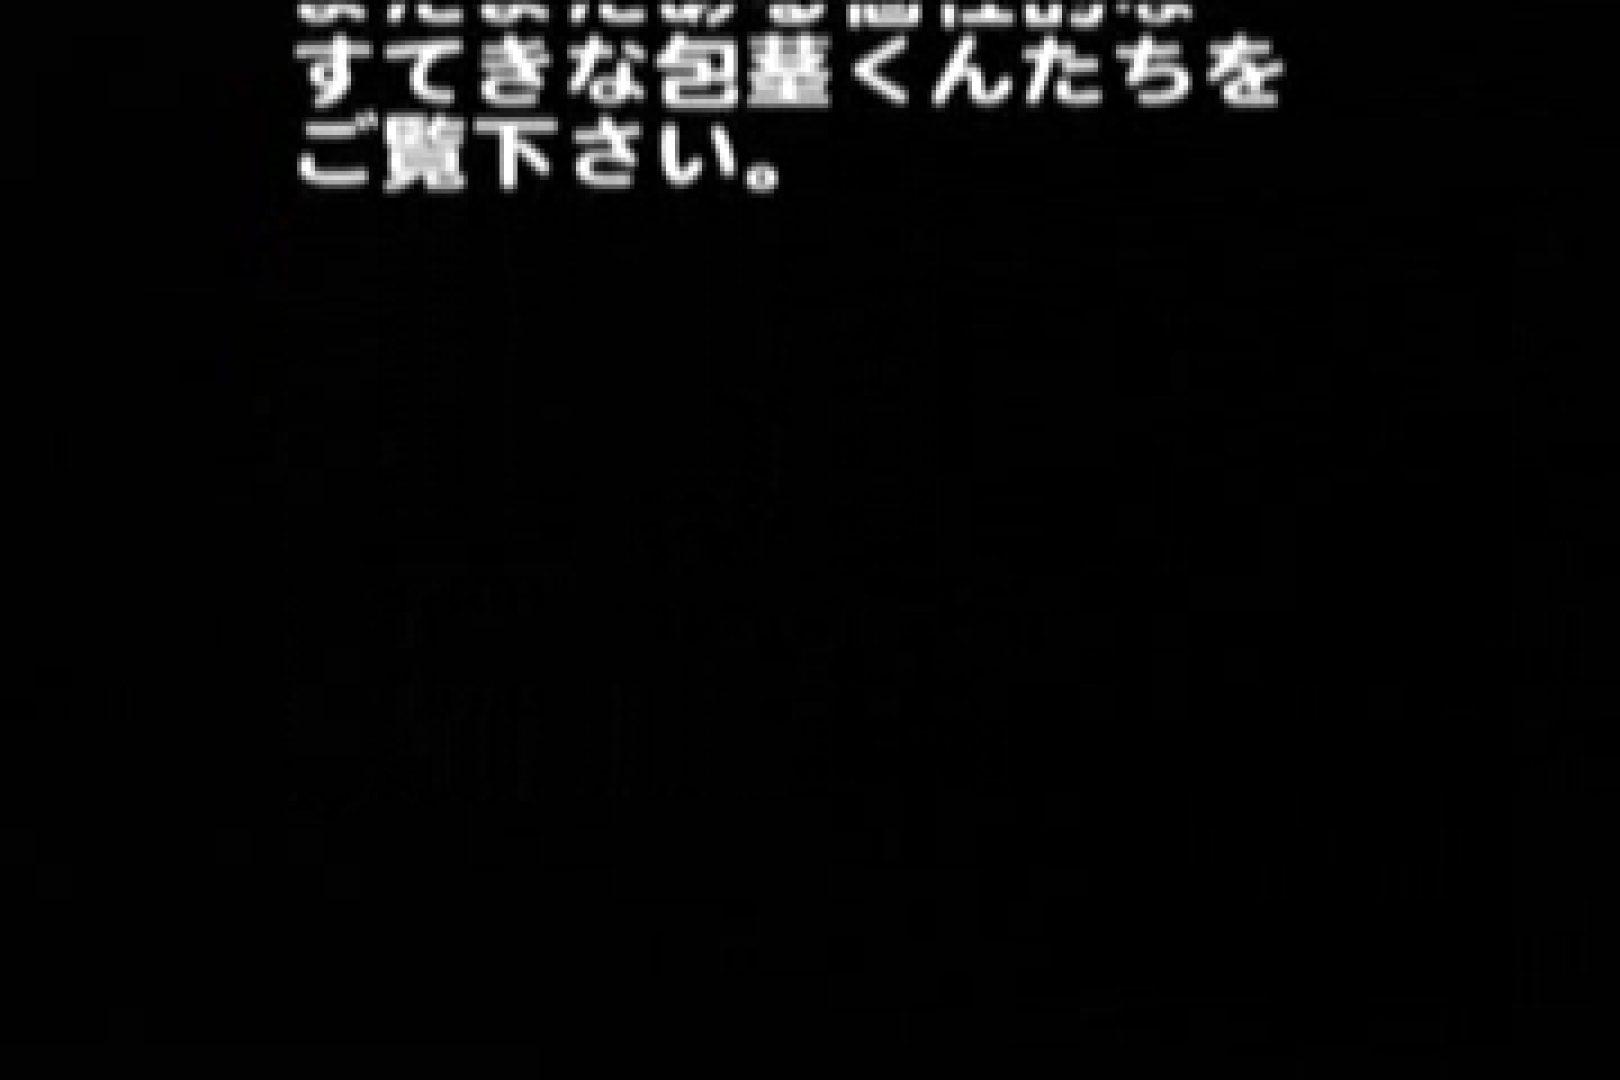 BABY FACEな包茎事情!!4FACEの快楽 射精天国 | オナニー GAY無修正エロ動画 51pic 1